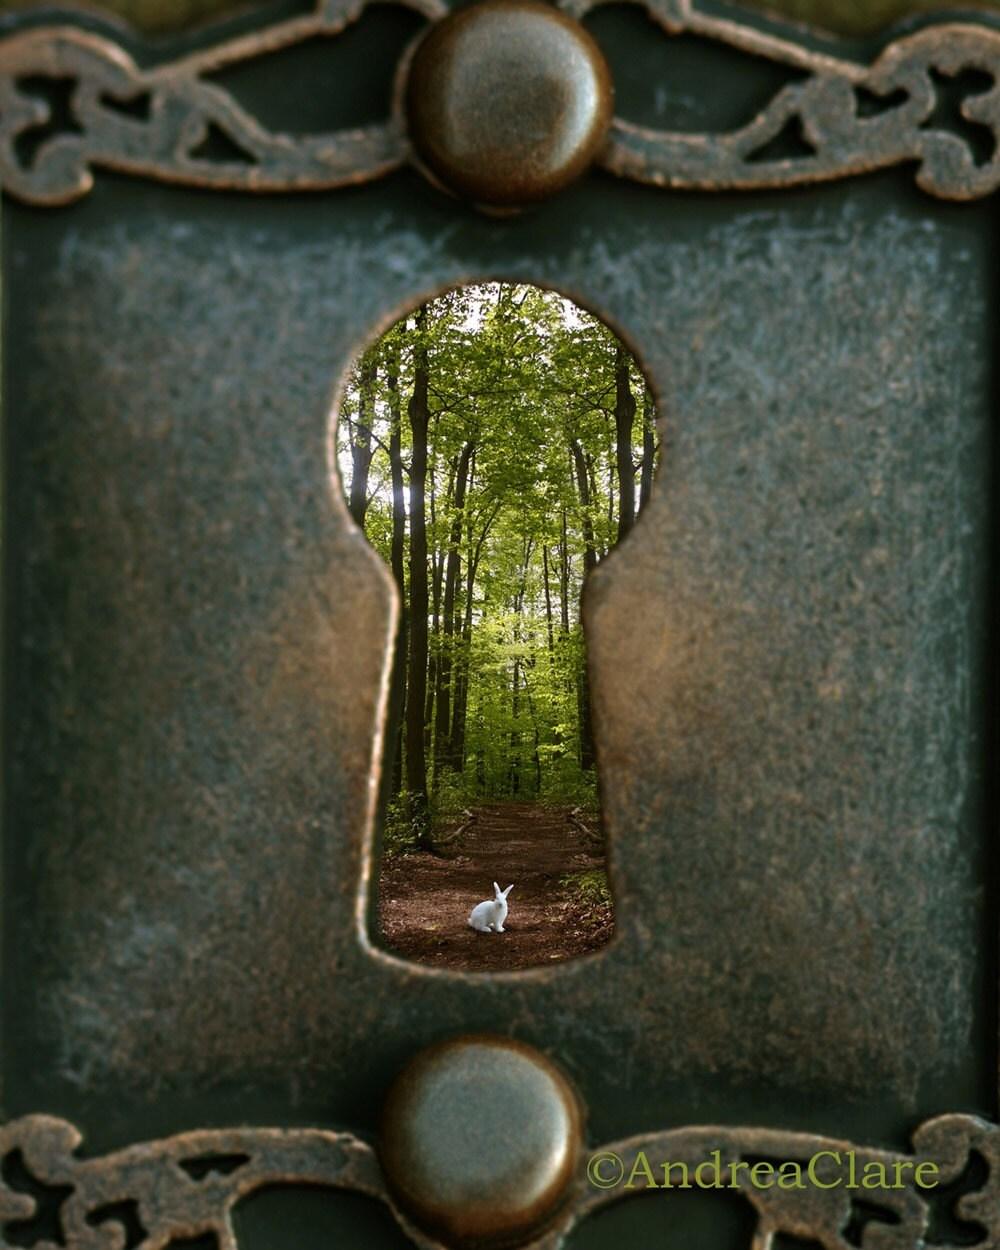 Alice in Wonderland Rabbit Follow Me 8x10 Fine Art Photograph - PhotoReverie